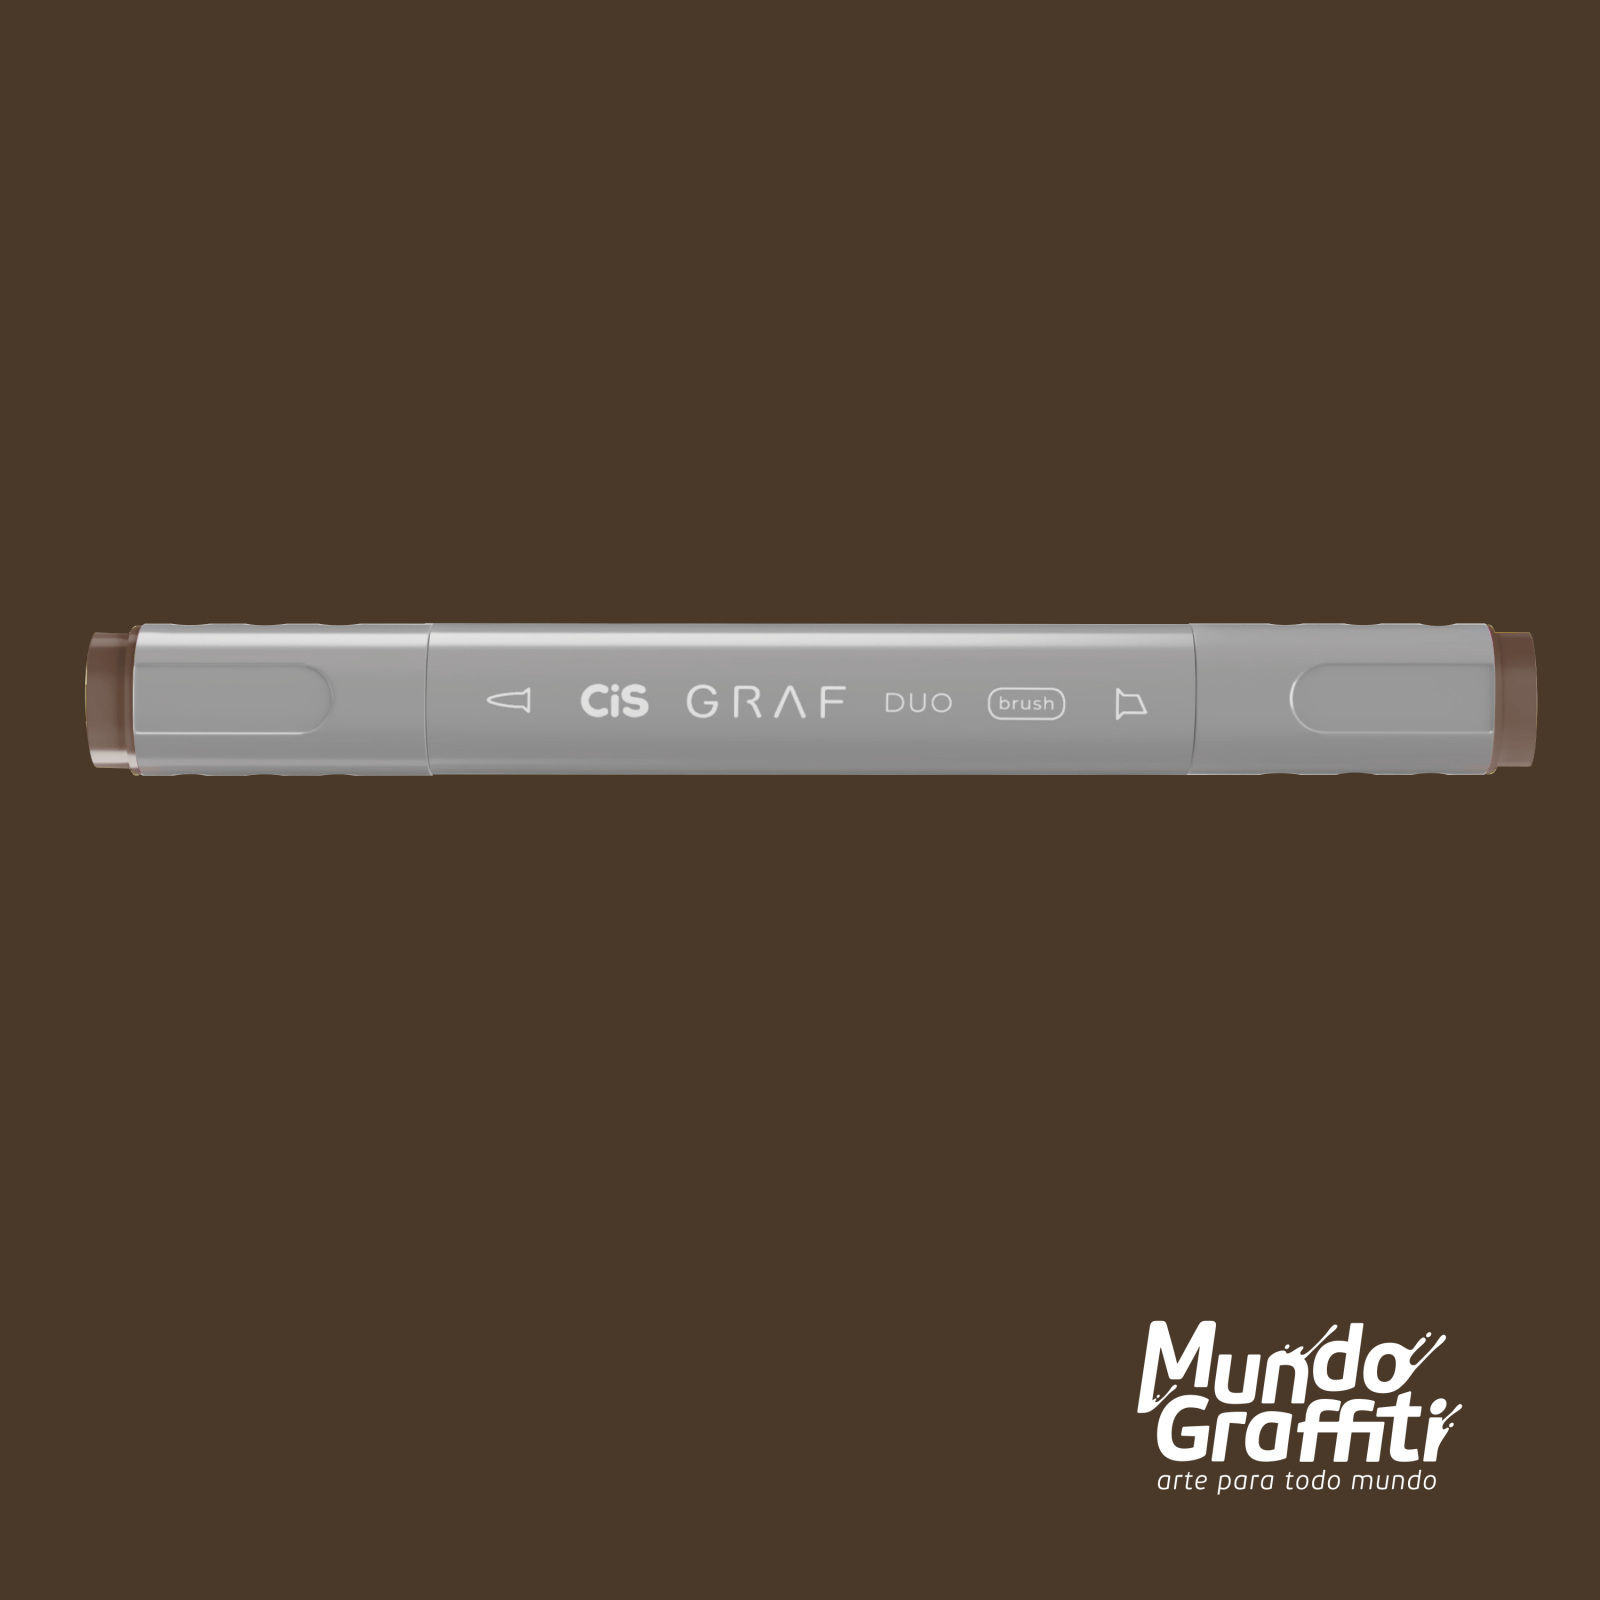 Marcador Cis Graf Duo Brush Chestnut Brown 98 - Mundo Graffiti